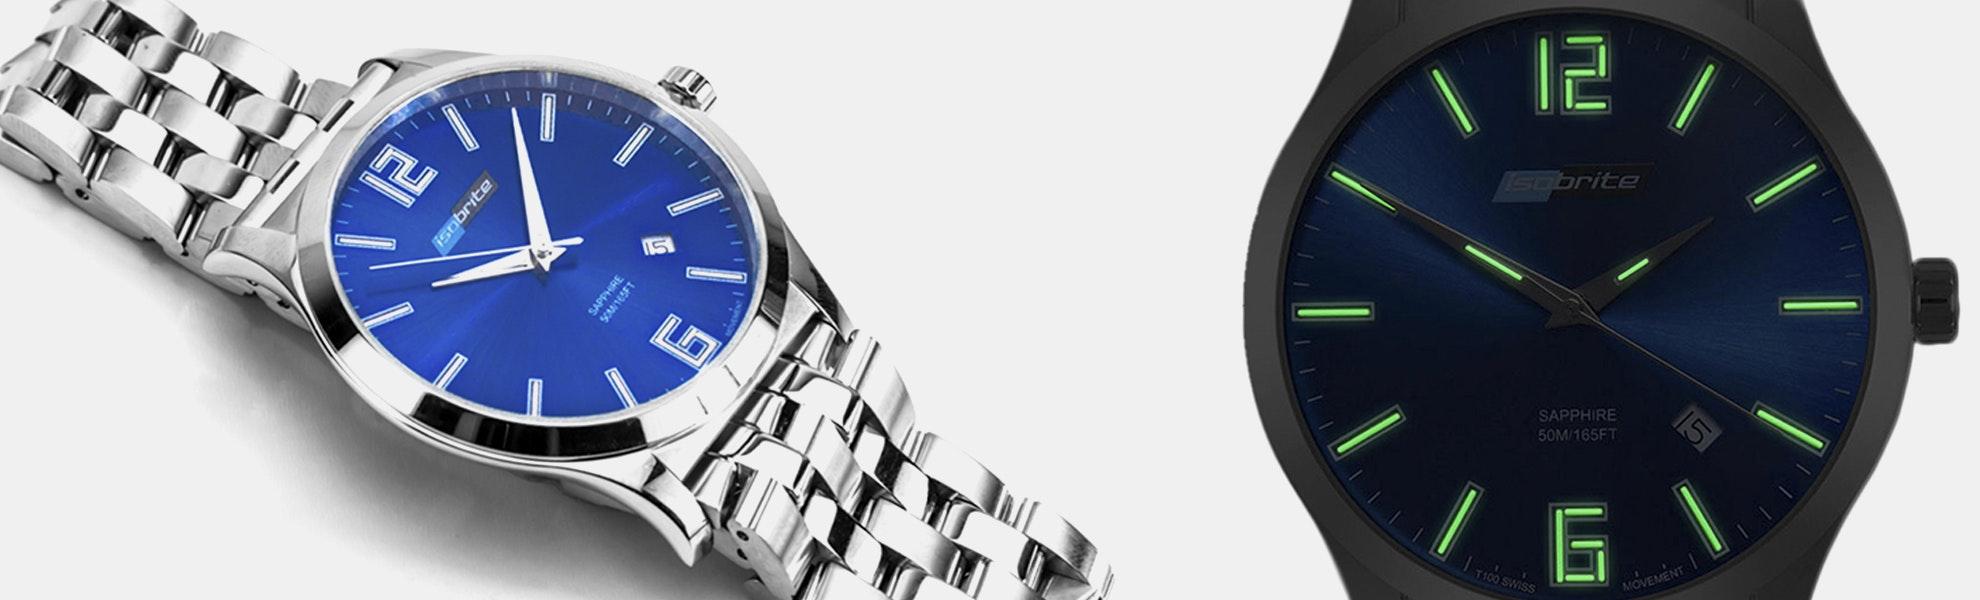 Isobrite T100 Tritium Slim Blue Watch